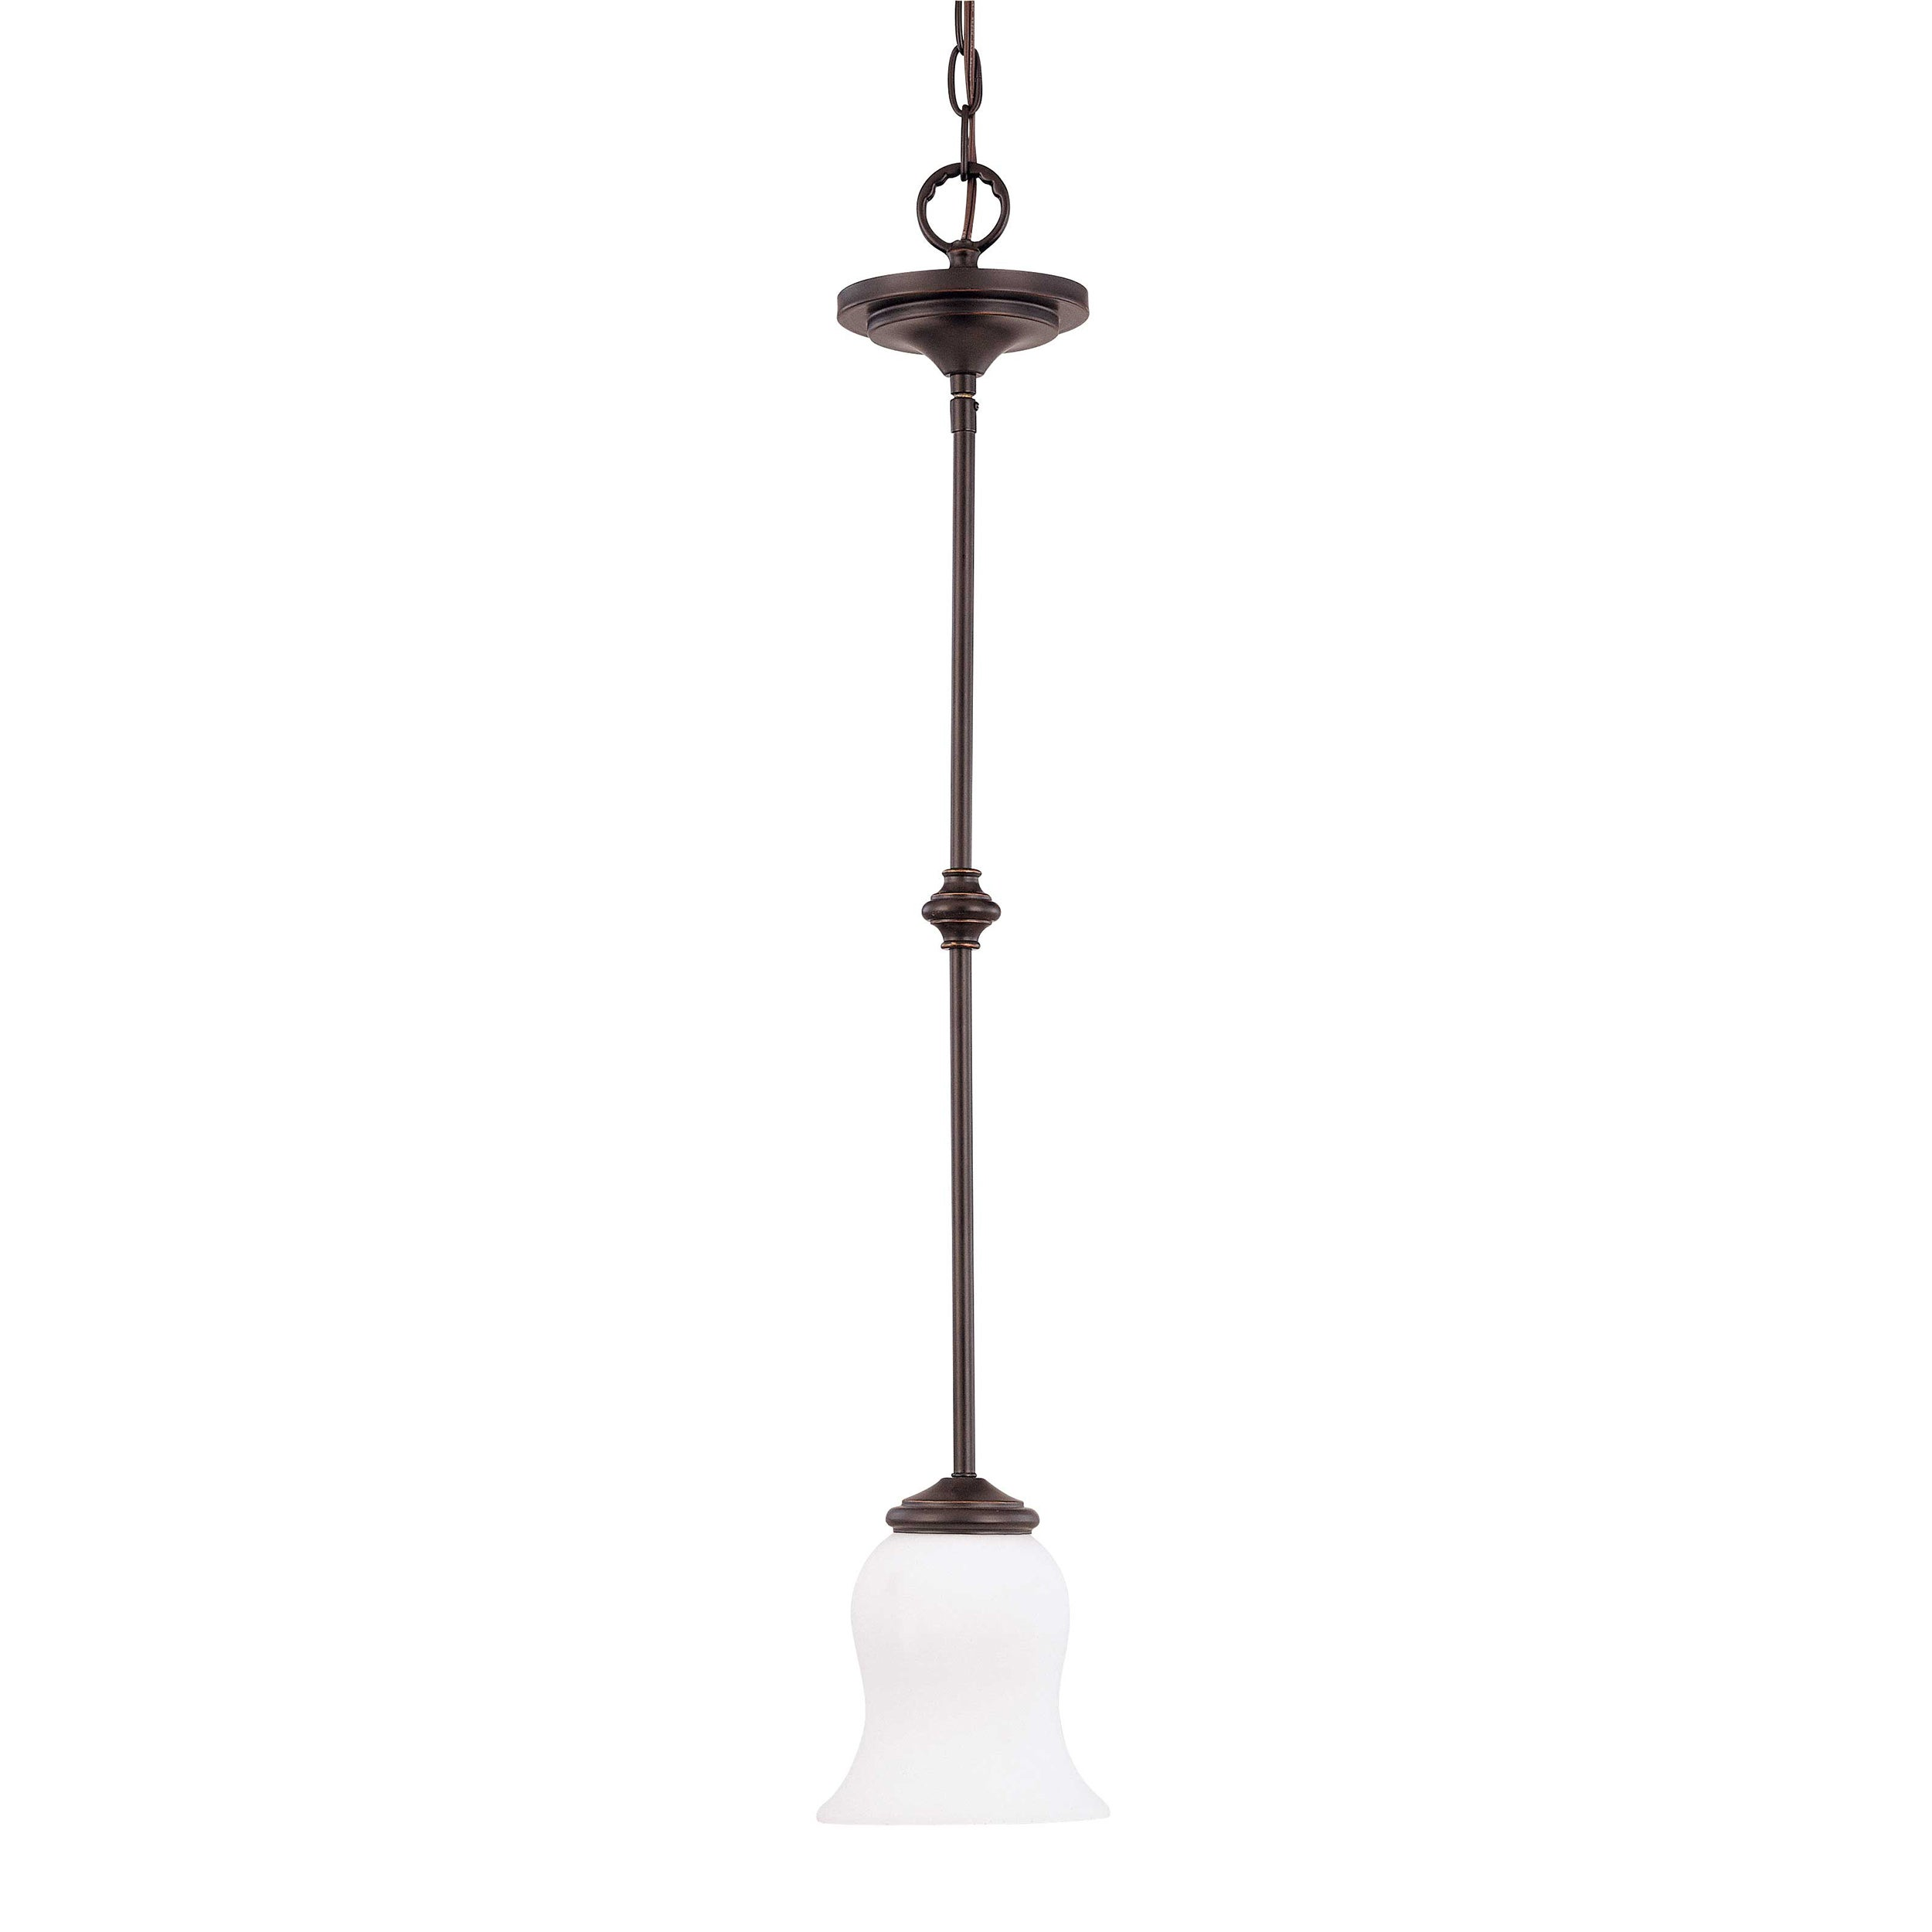 Glenwood 1 Light Sudbury Bronze With Satin White Glass Mini Pendant